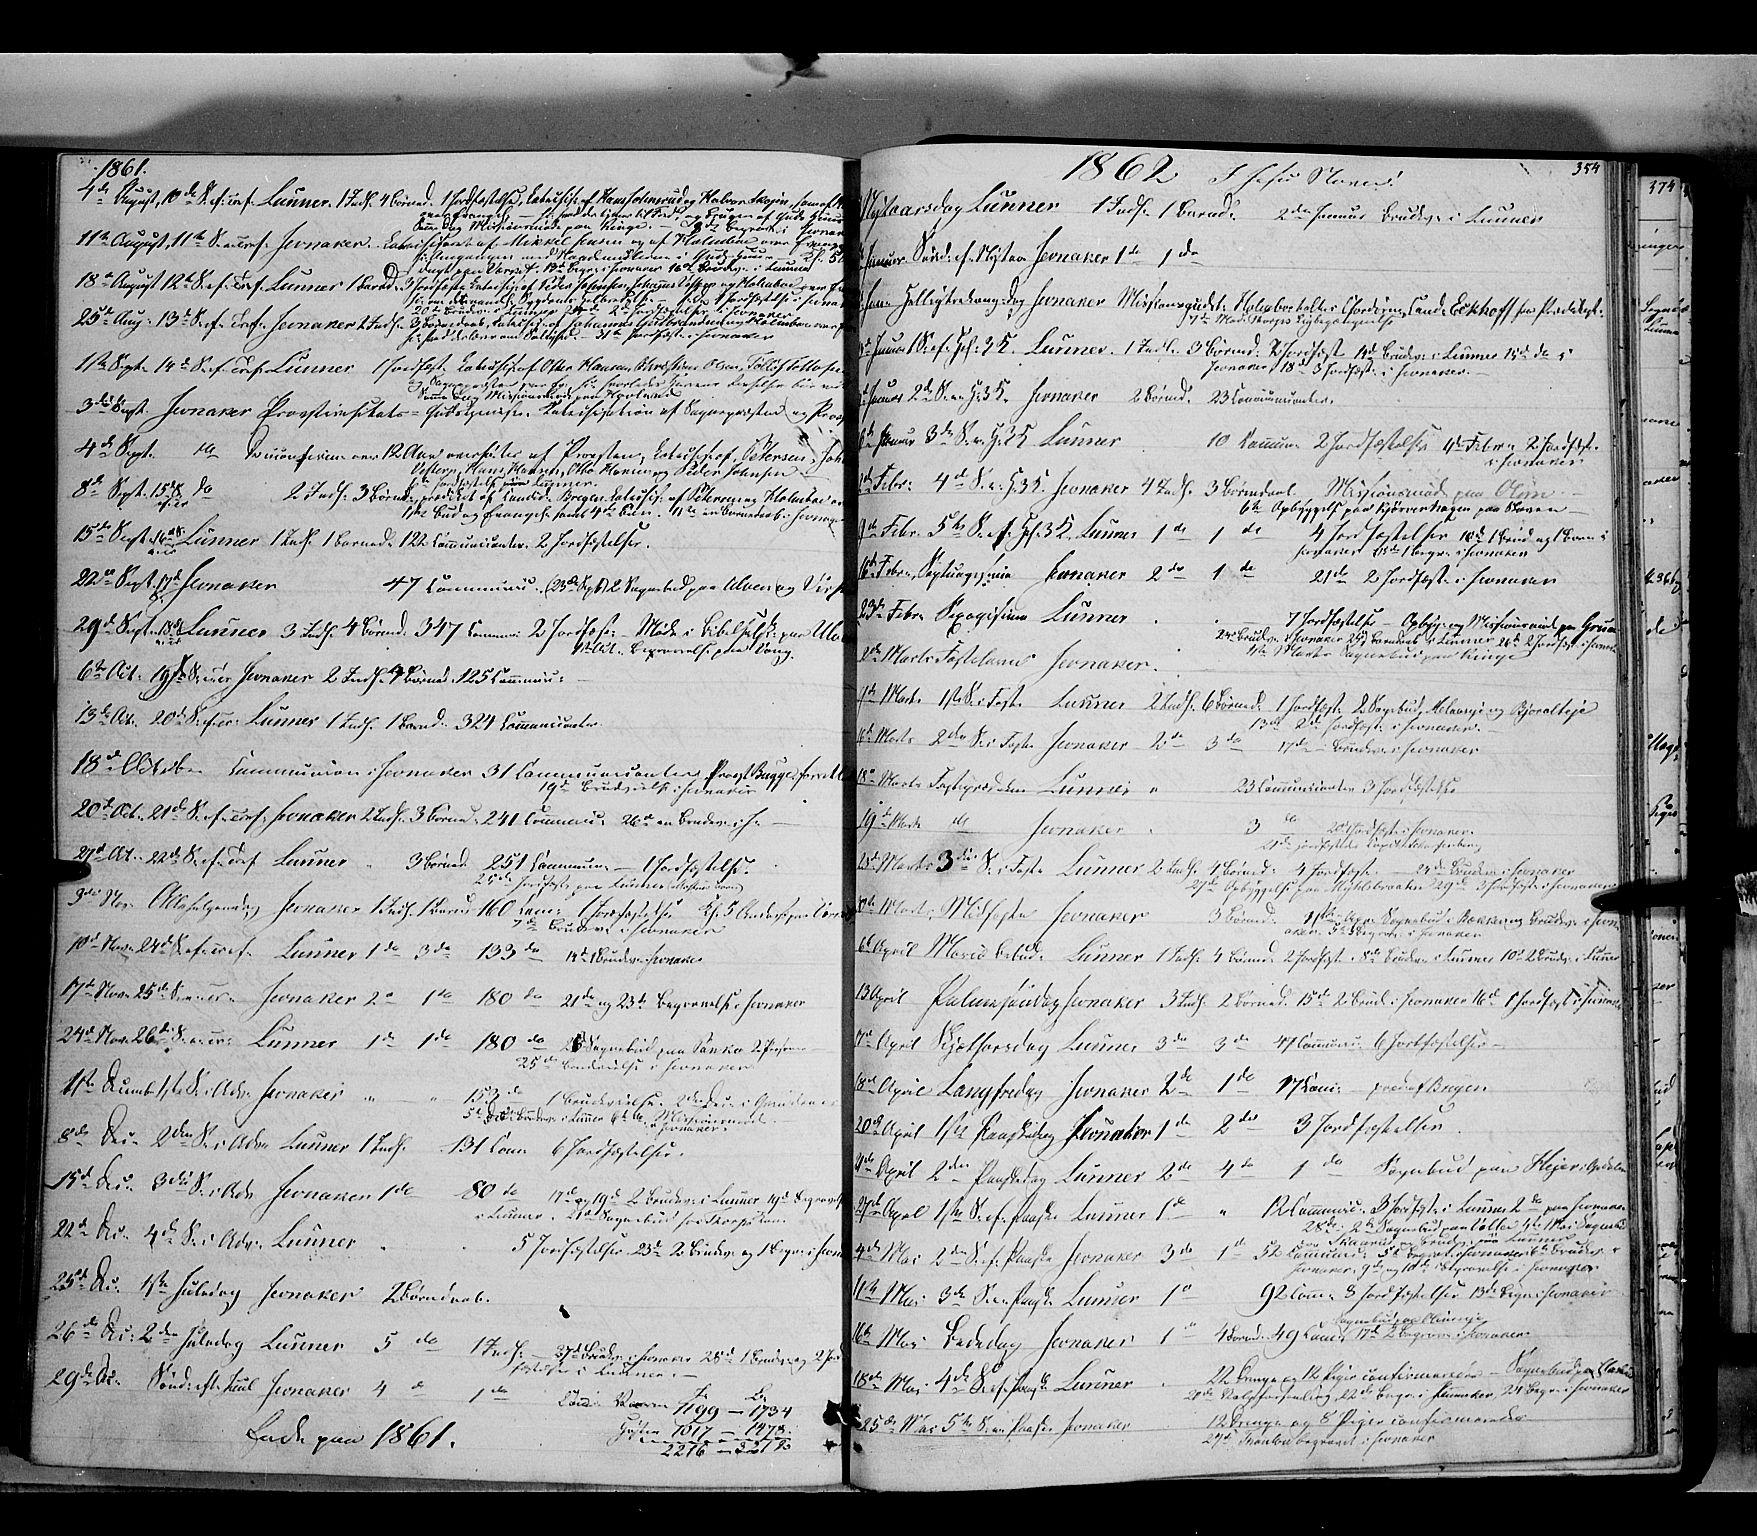 SAH, Jevnaker prestekontor, Ministerialbok nr. 7, 1858-1876, s. 354